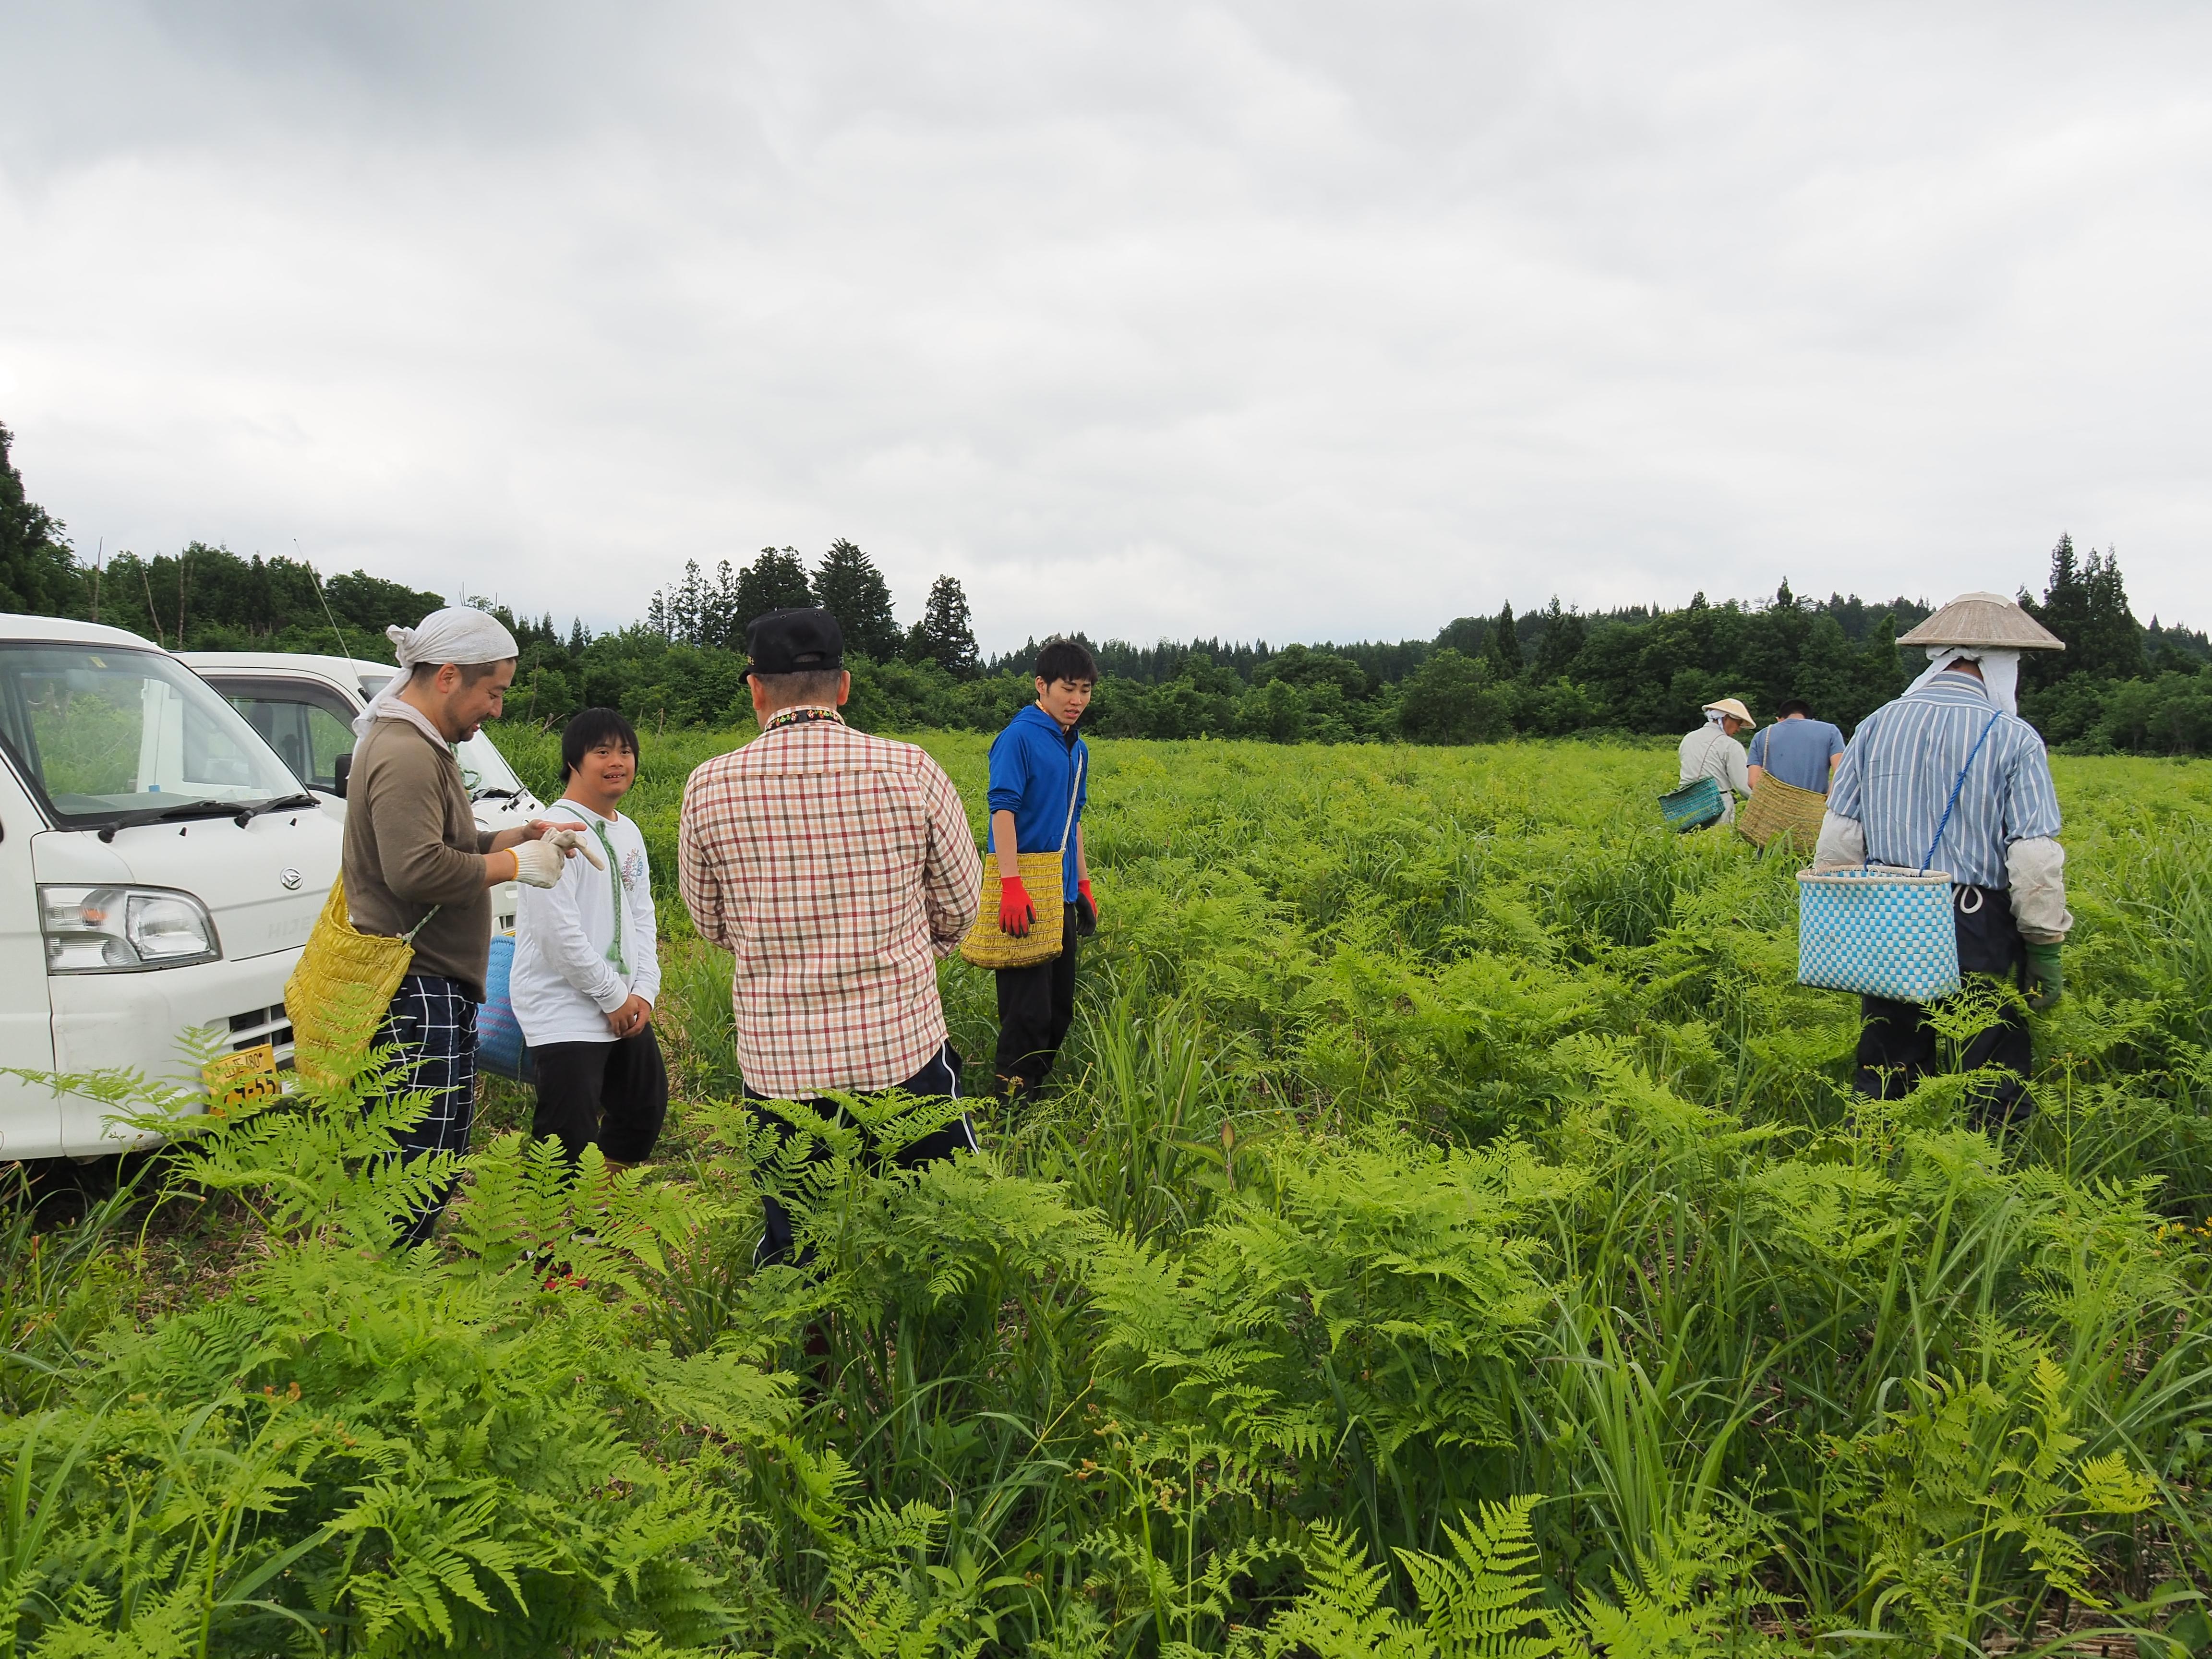 P6170083 - 山形県戸沢村での農業イベント